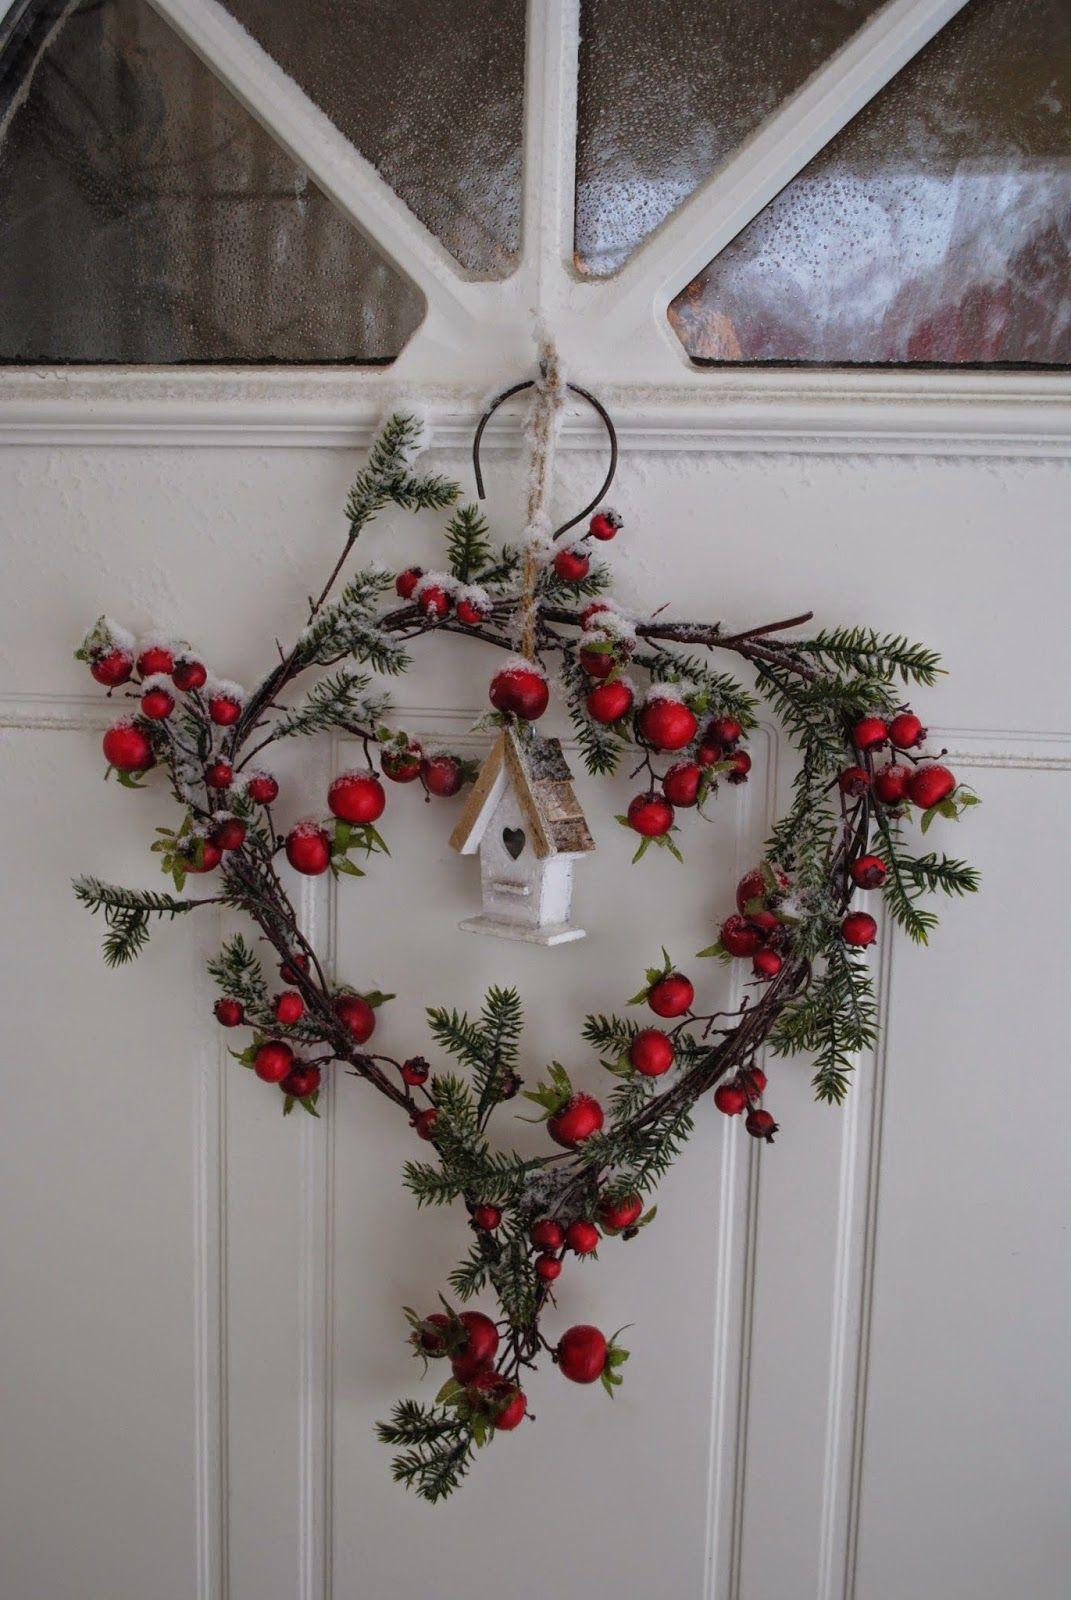 Super cute DIY Holiday Wreath Christmas wreaths